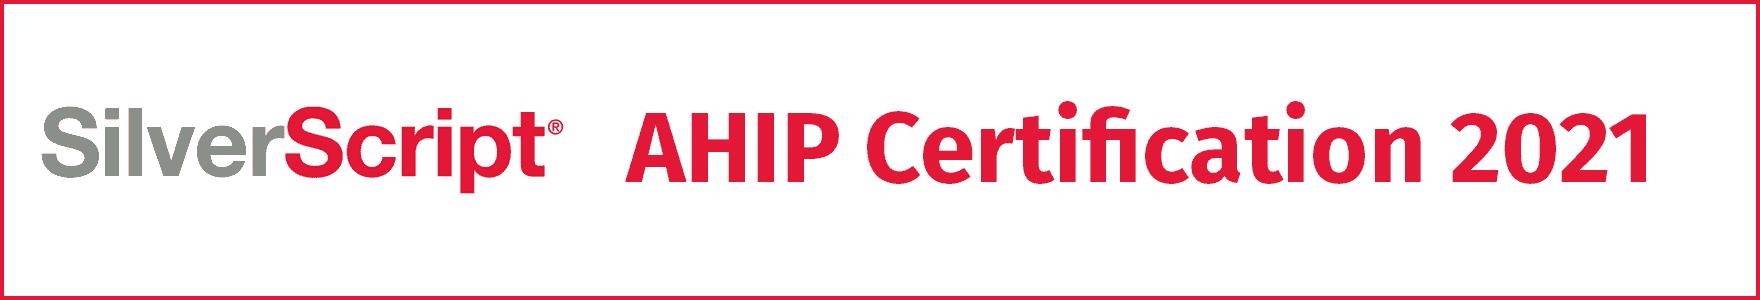 SilverScript AHIP Certification 2021